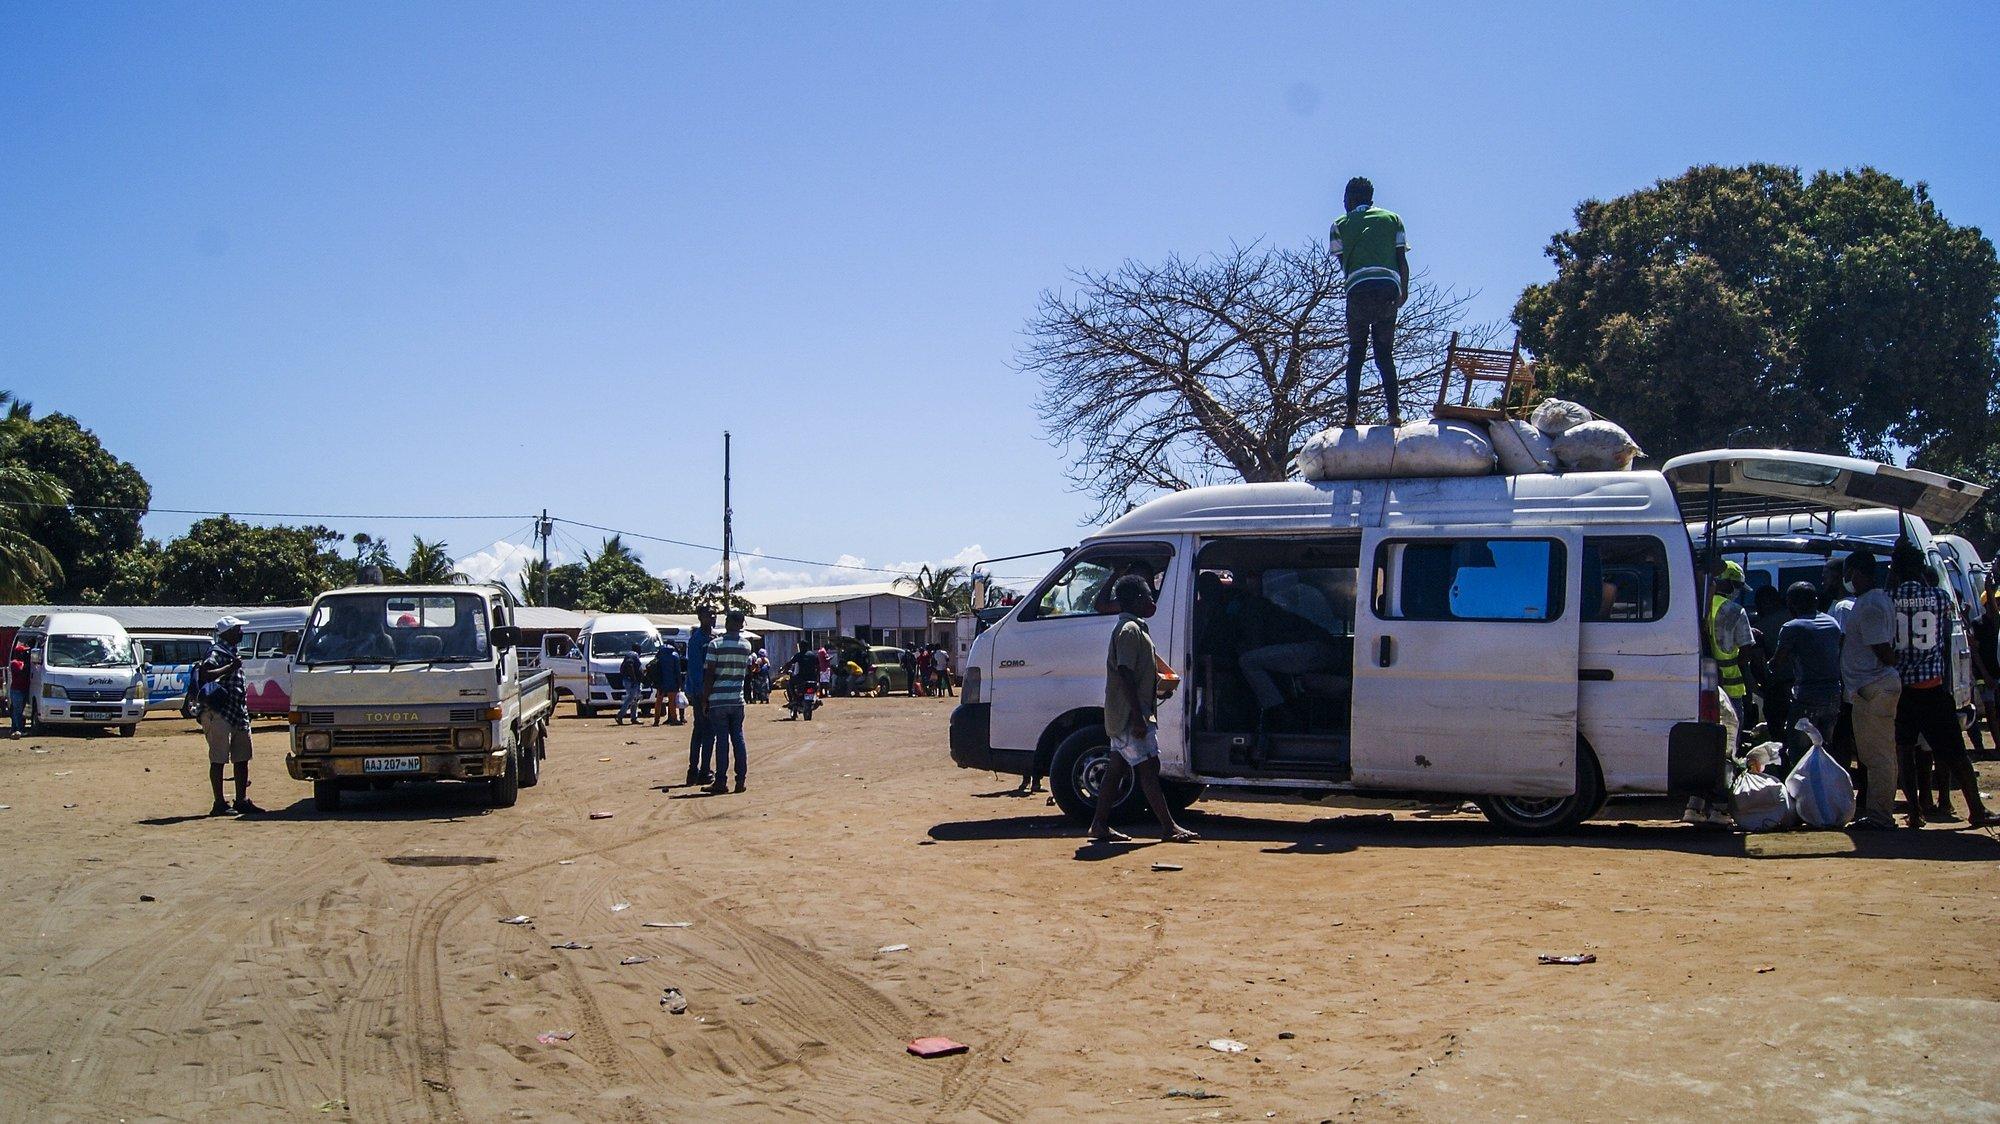 Terminal rodoviário de passageiros de Pemba, Cabo Delgado, Moçambique, 19 de agosto de 2021. Na sequência dos ataques, que aterrorizam a província de Cabo Delgado desde 2017, há mais de 3.100 mortes, segundo o projeto de registo de conflitos ACLED, e mais de 817 mil deslocados, segundo as autoridades moçambicanas. (ACOMPANHA TEXTO DE 20 DE AGOSTO DE 2021). LUÍSA NHANTUMBO/LUSA